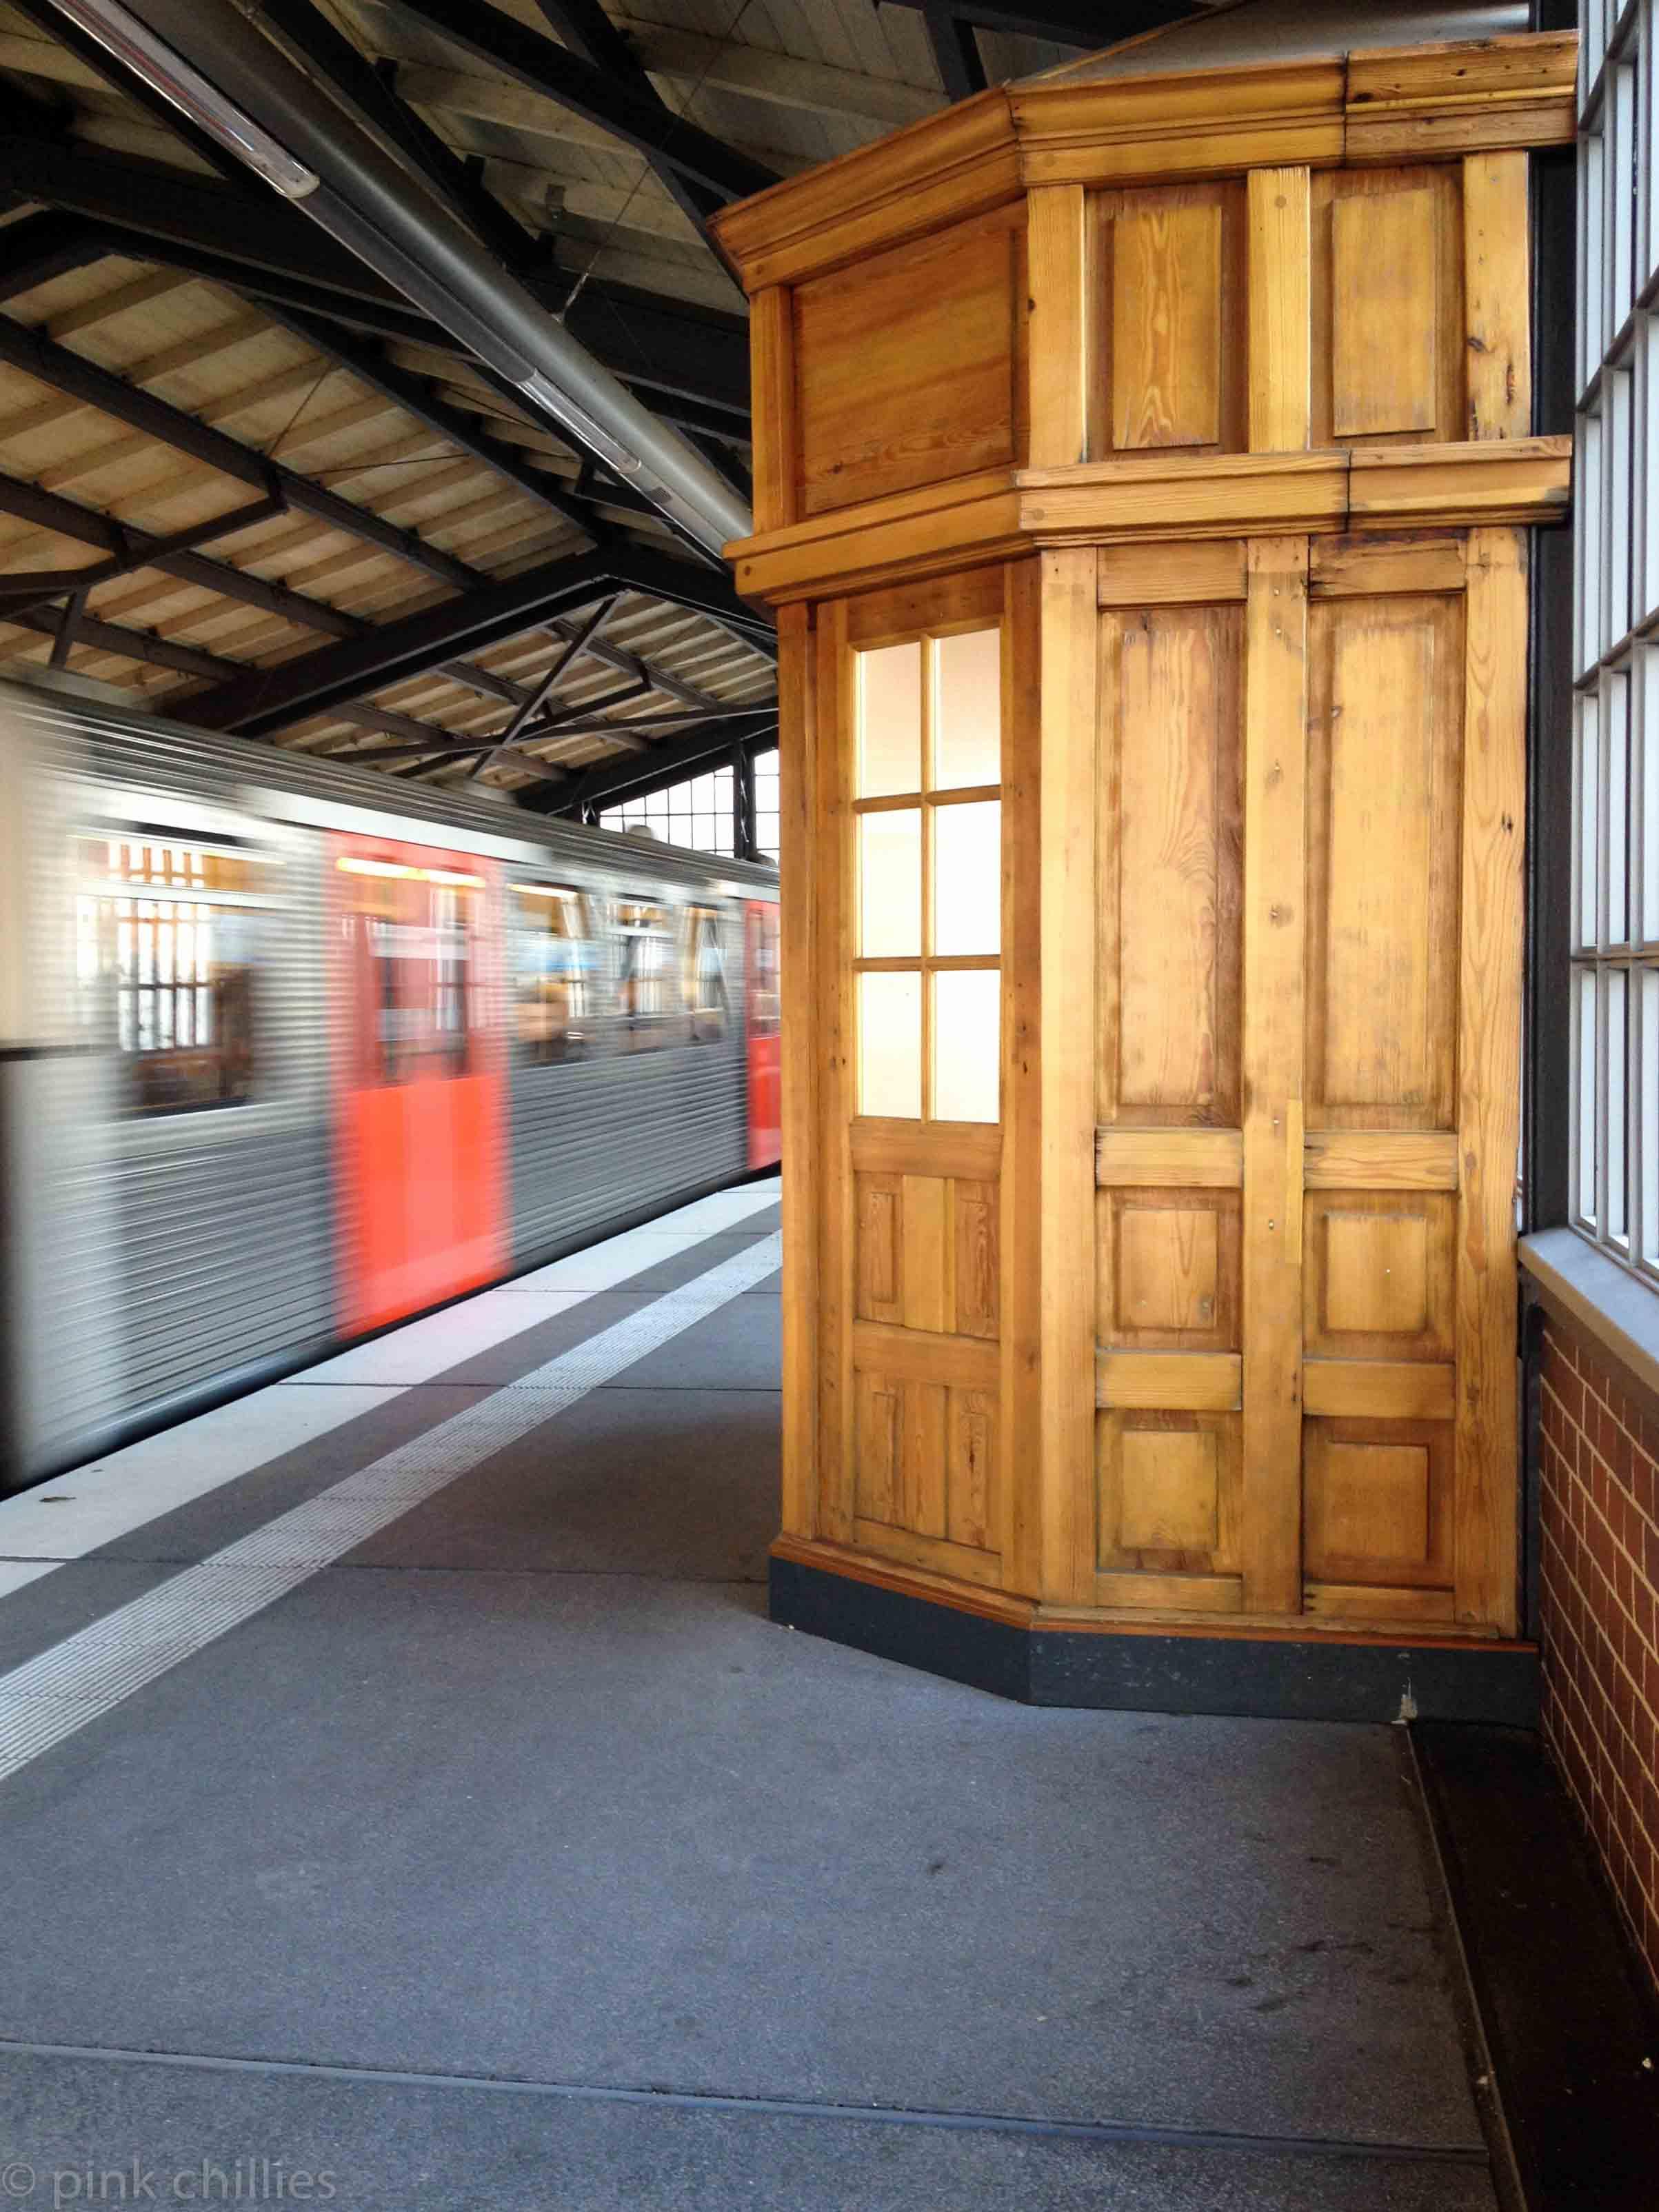 U-Bahn Station in Hamburg